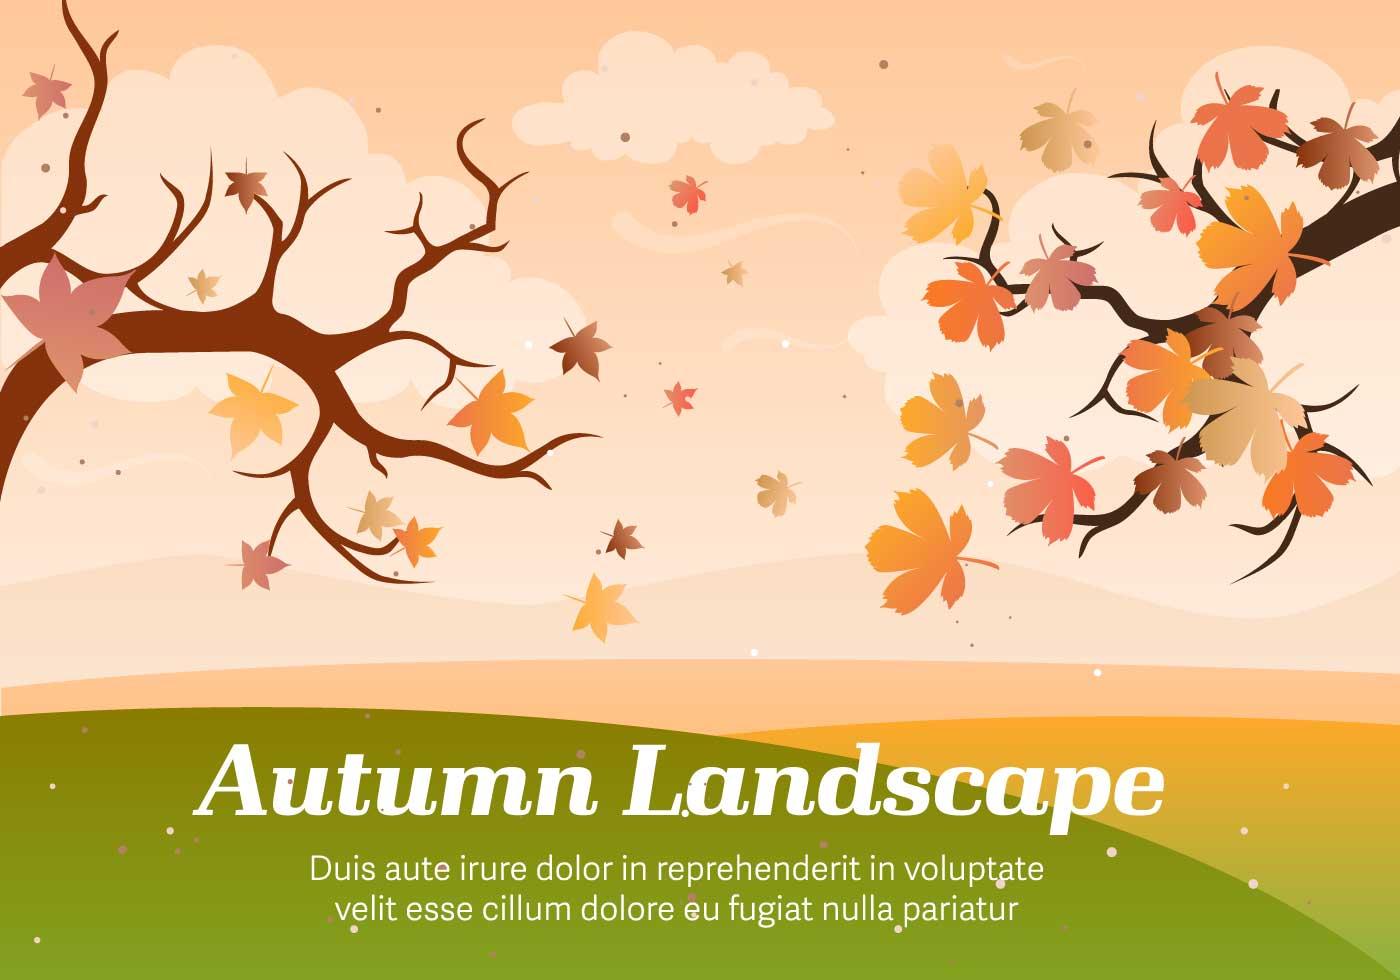 Landscape Illustration Vector Free: Autumn Landscape Vector Illustration